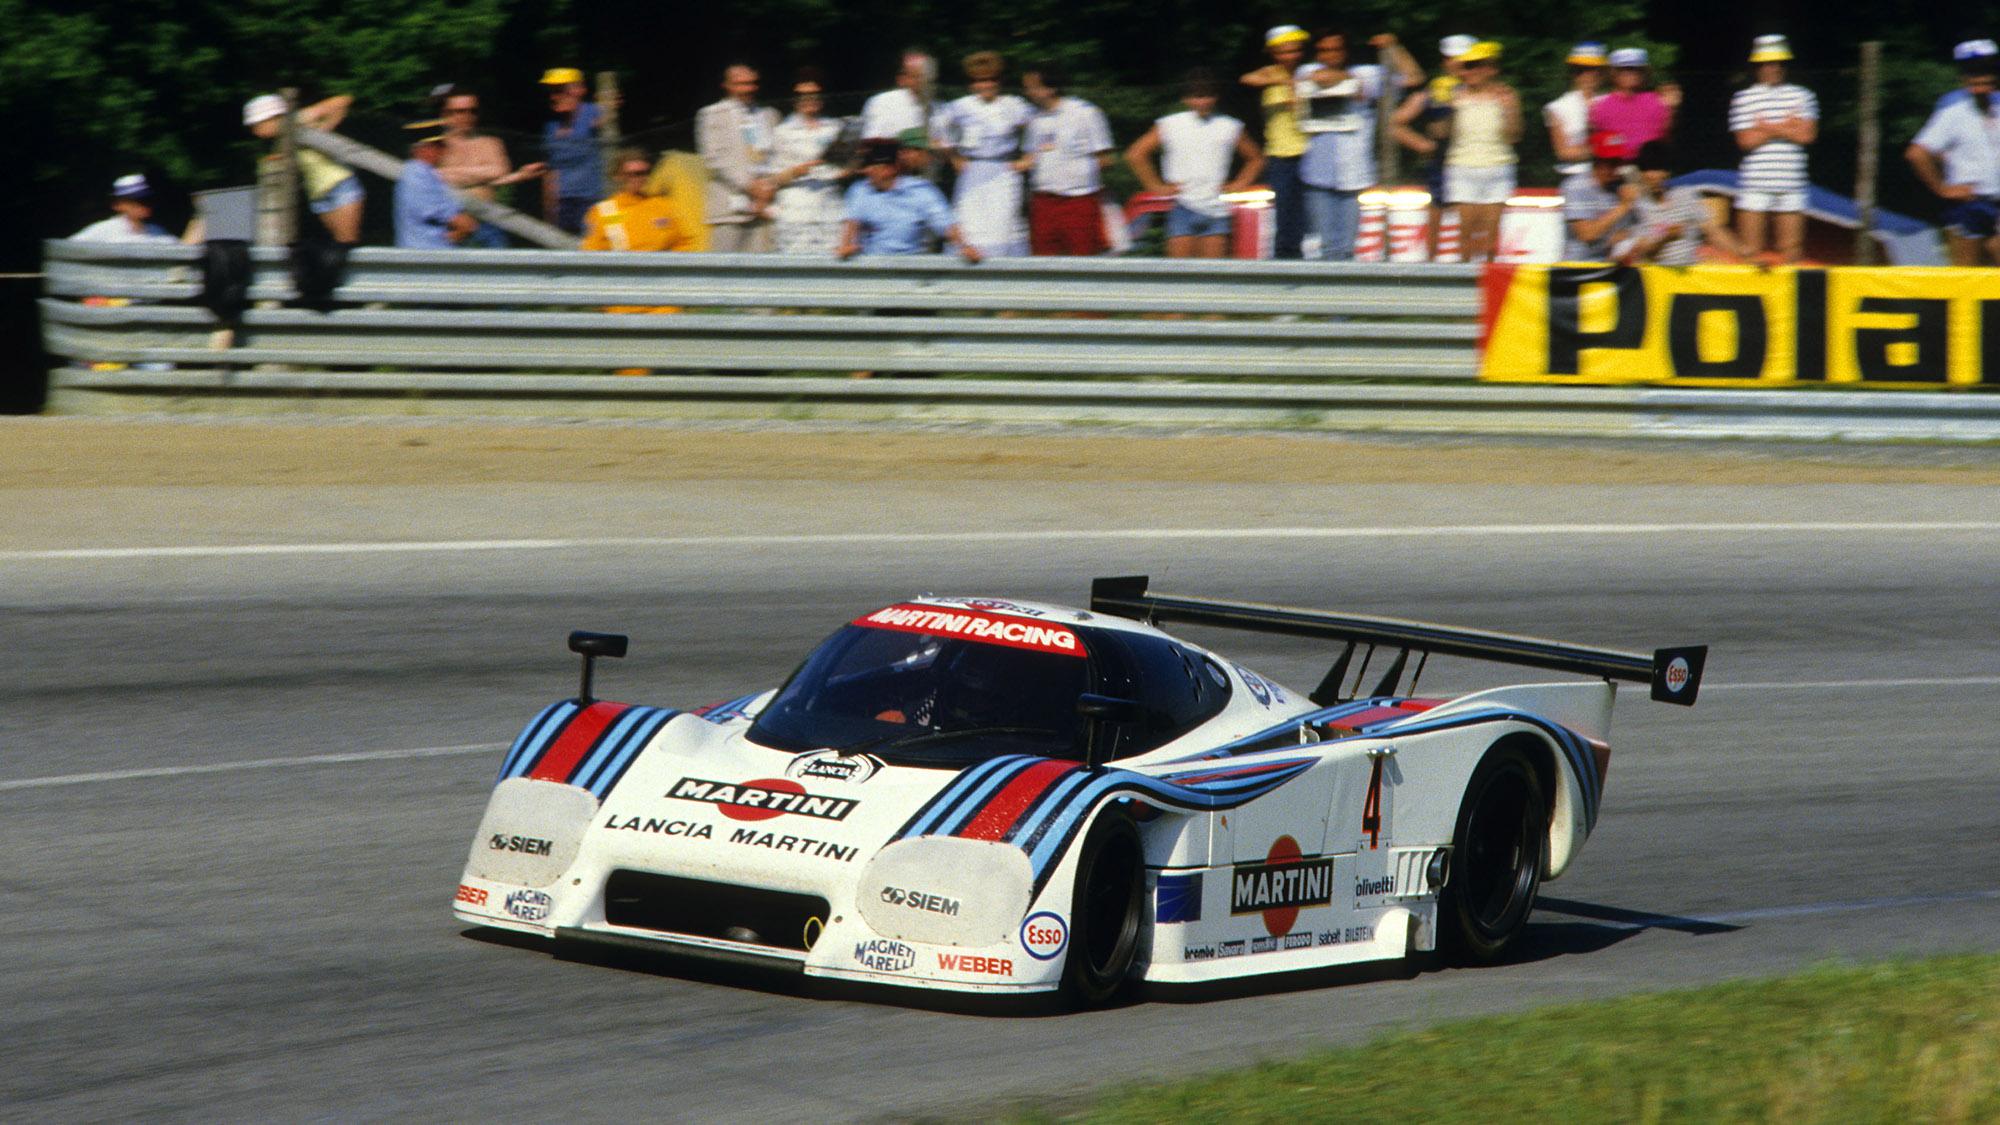 Bob Wollek Alessandro Nannini Lancia at the 1984 Le Mans 24 Hours